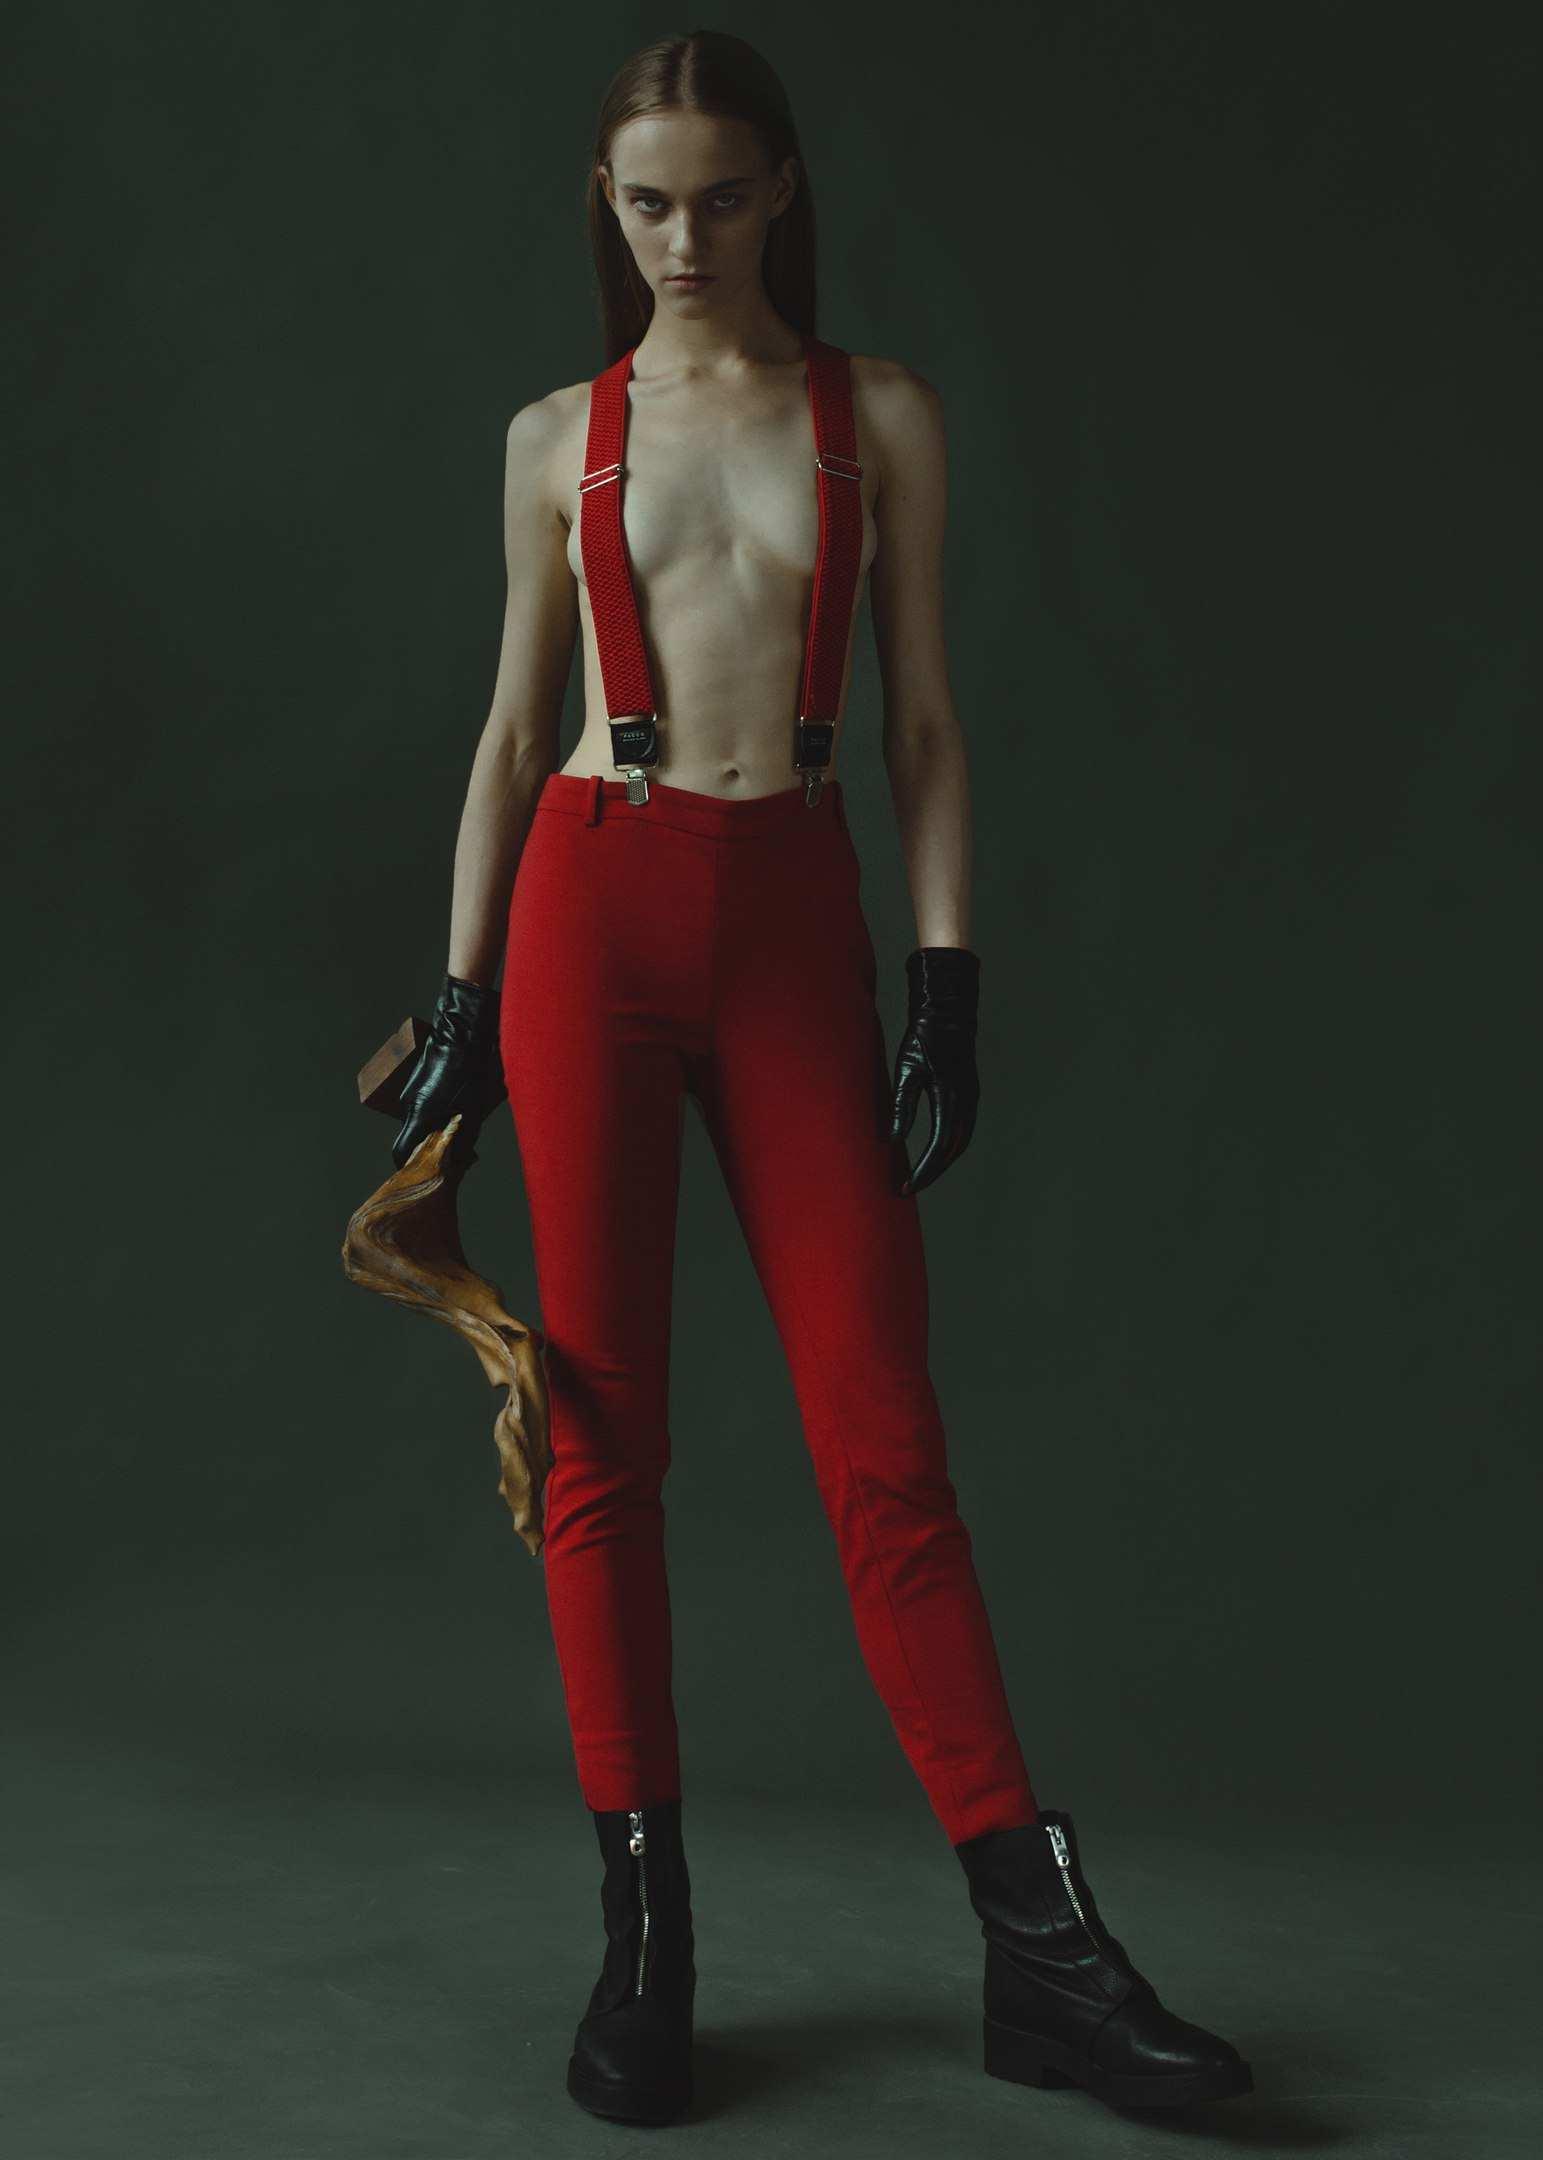 Vibrant Fashion Photography By Nicole Davidova